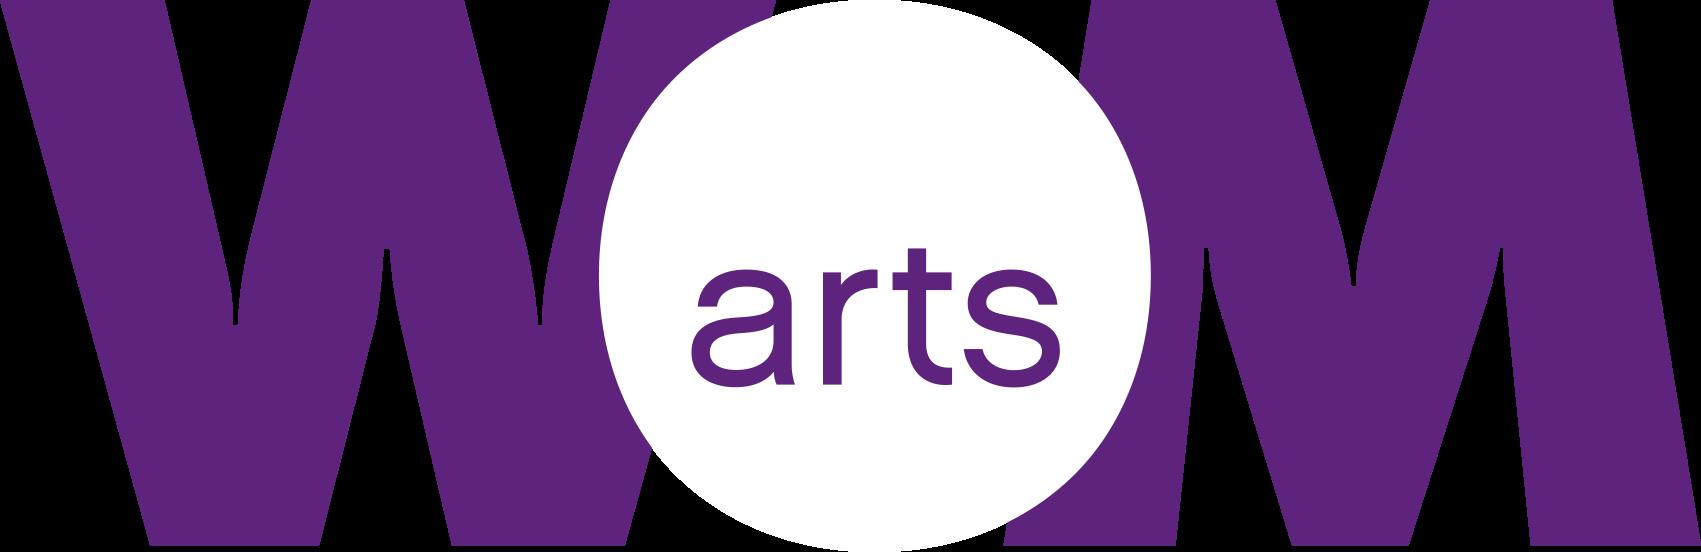 womarts_logo.png